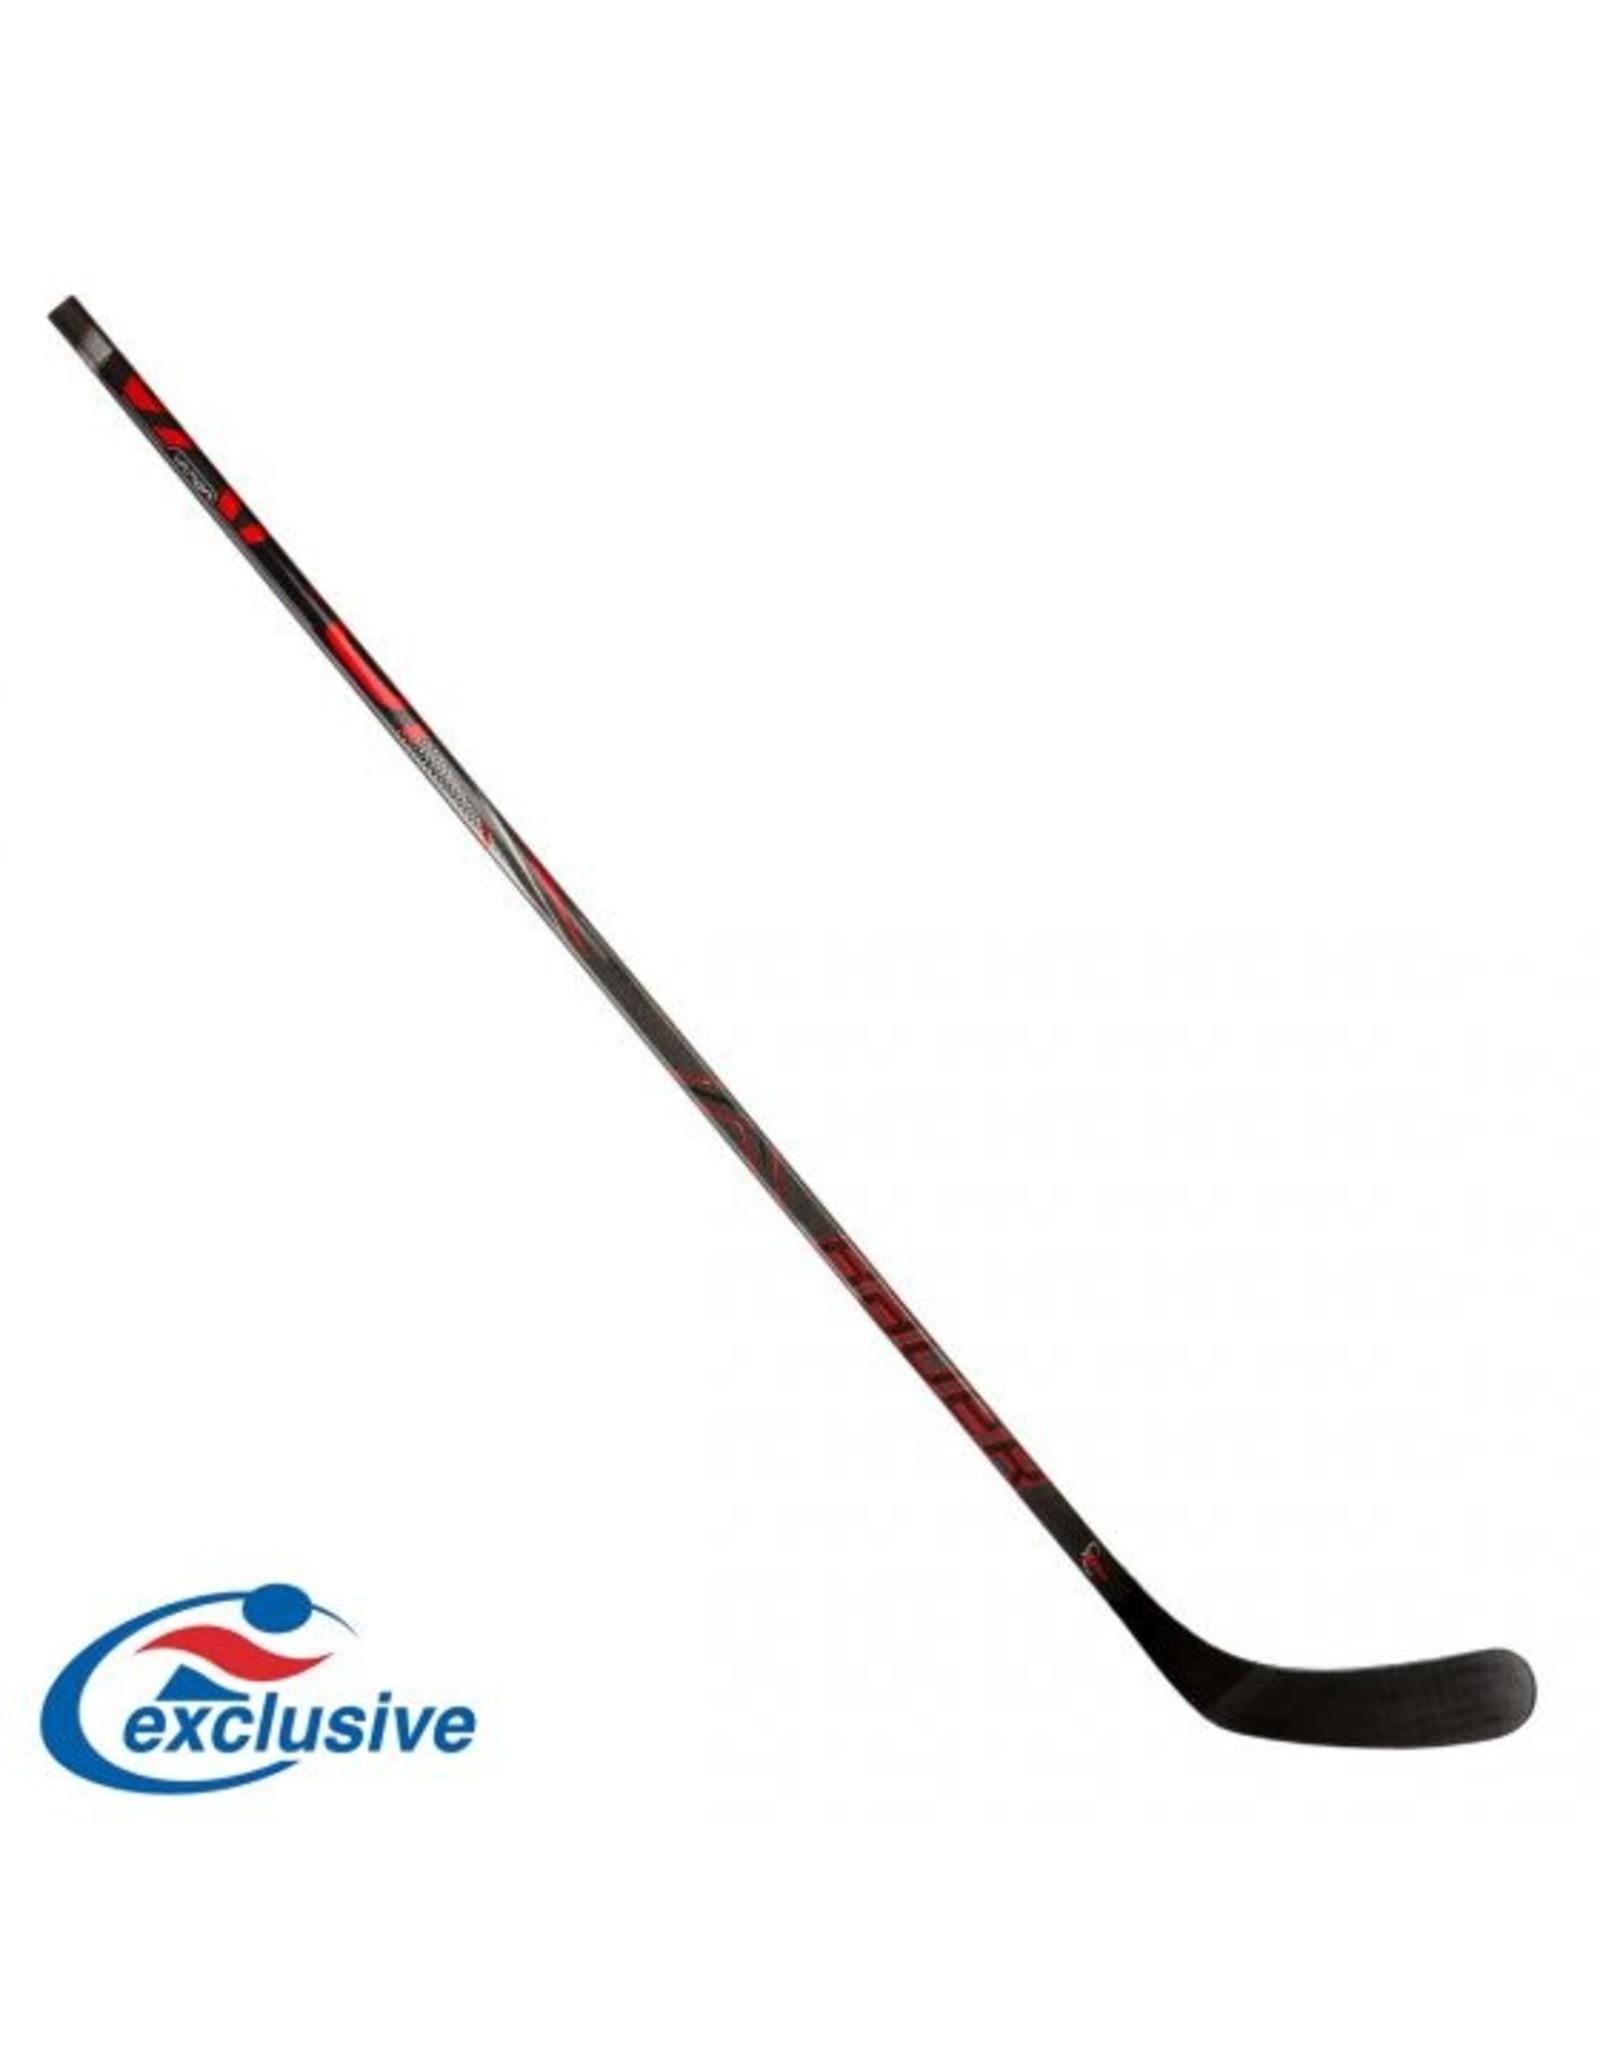 Bauer Hockey - Canada BAUER S19 VAPOR VLTX PRO+ JR OPS